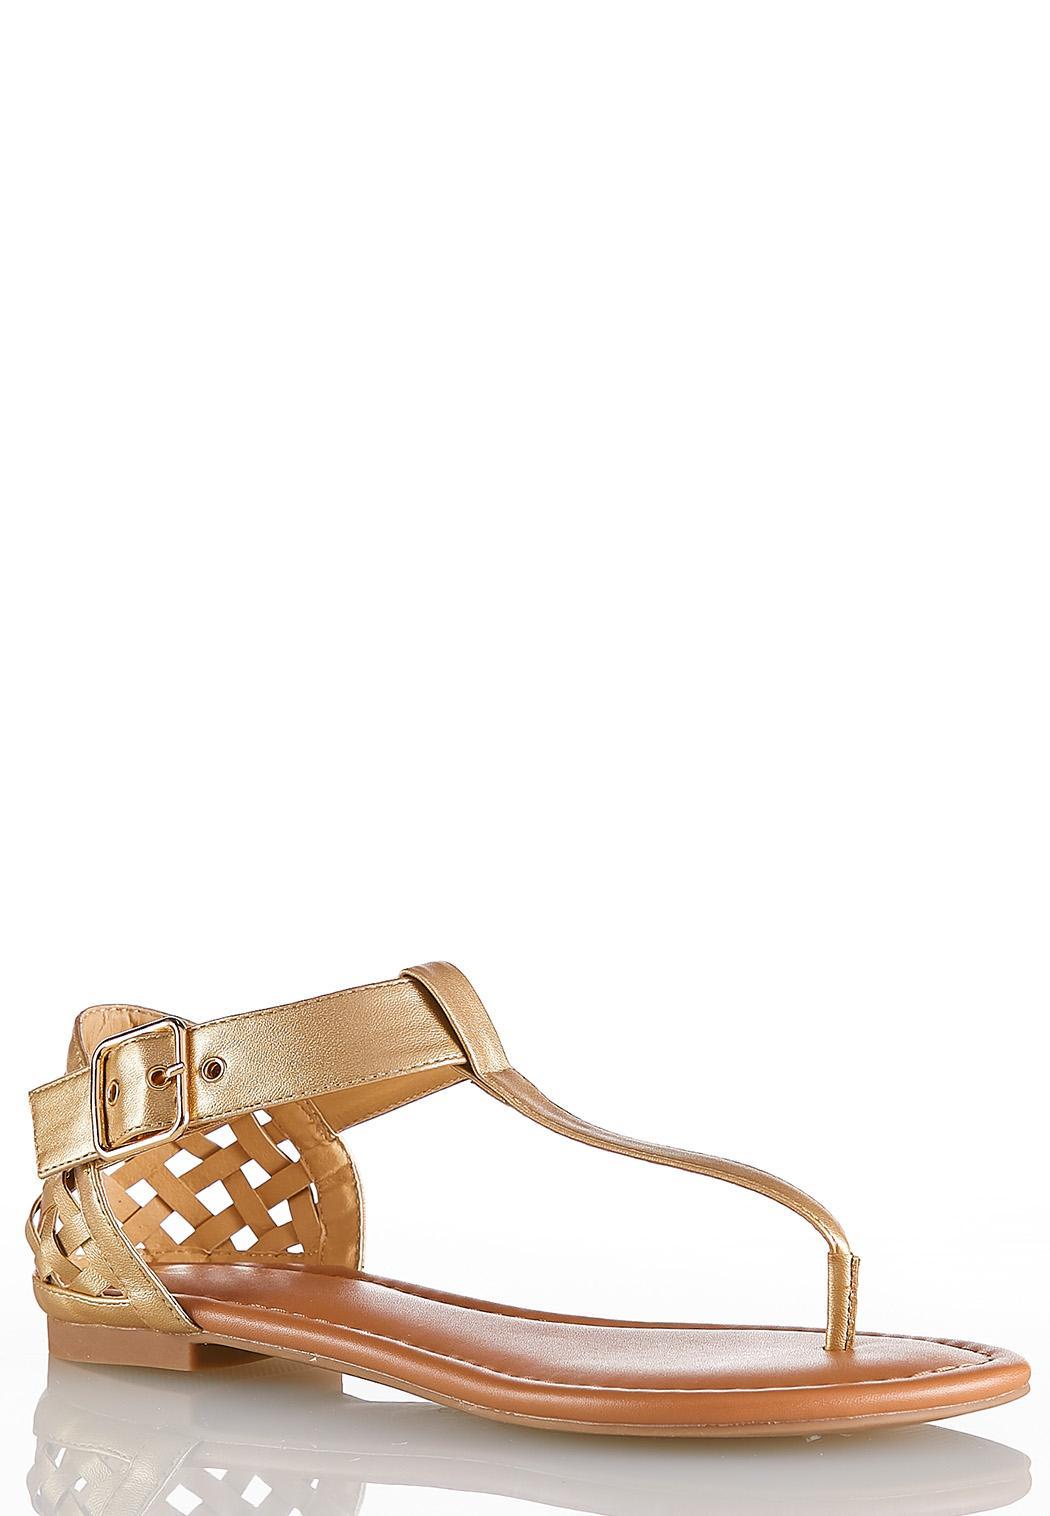 Woven Heel T-Strap Sandals